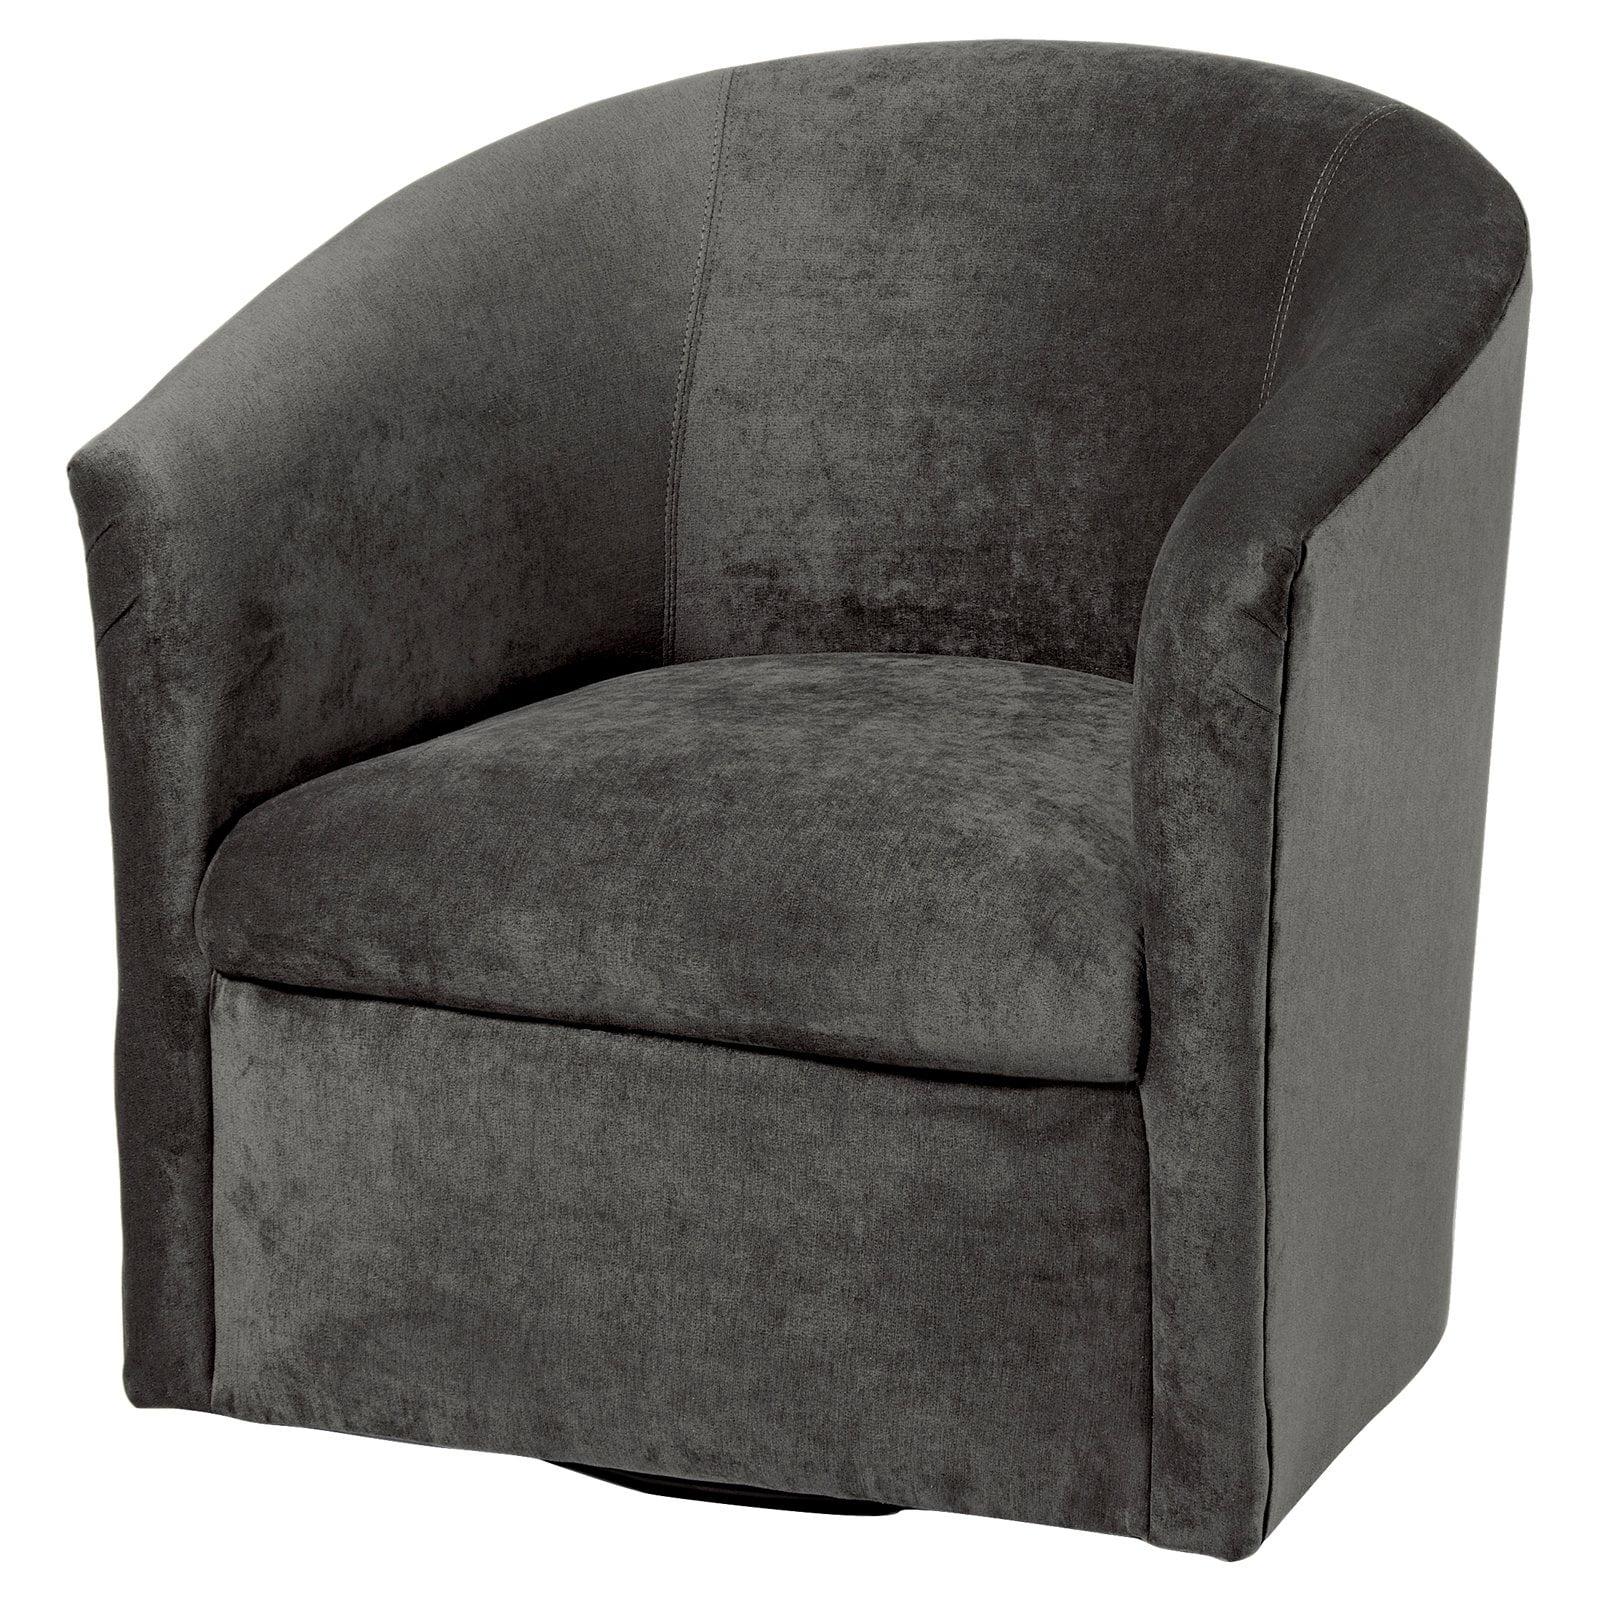 fort Pointe Elizabeth Swivel Chair Walmart